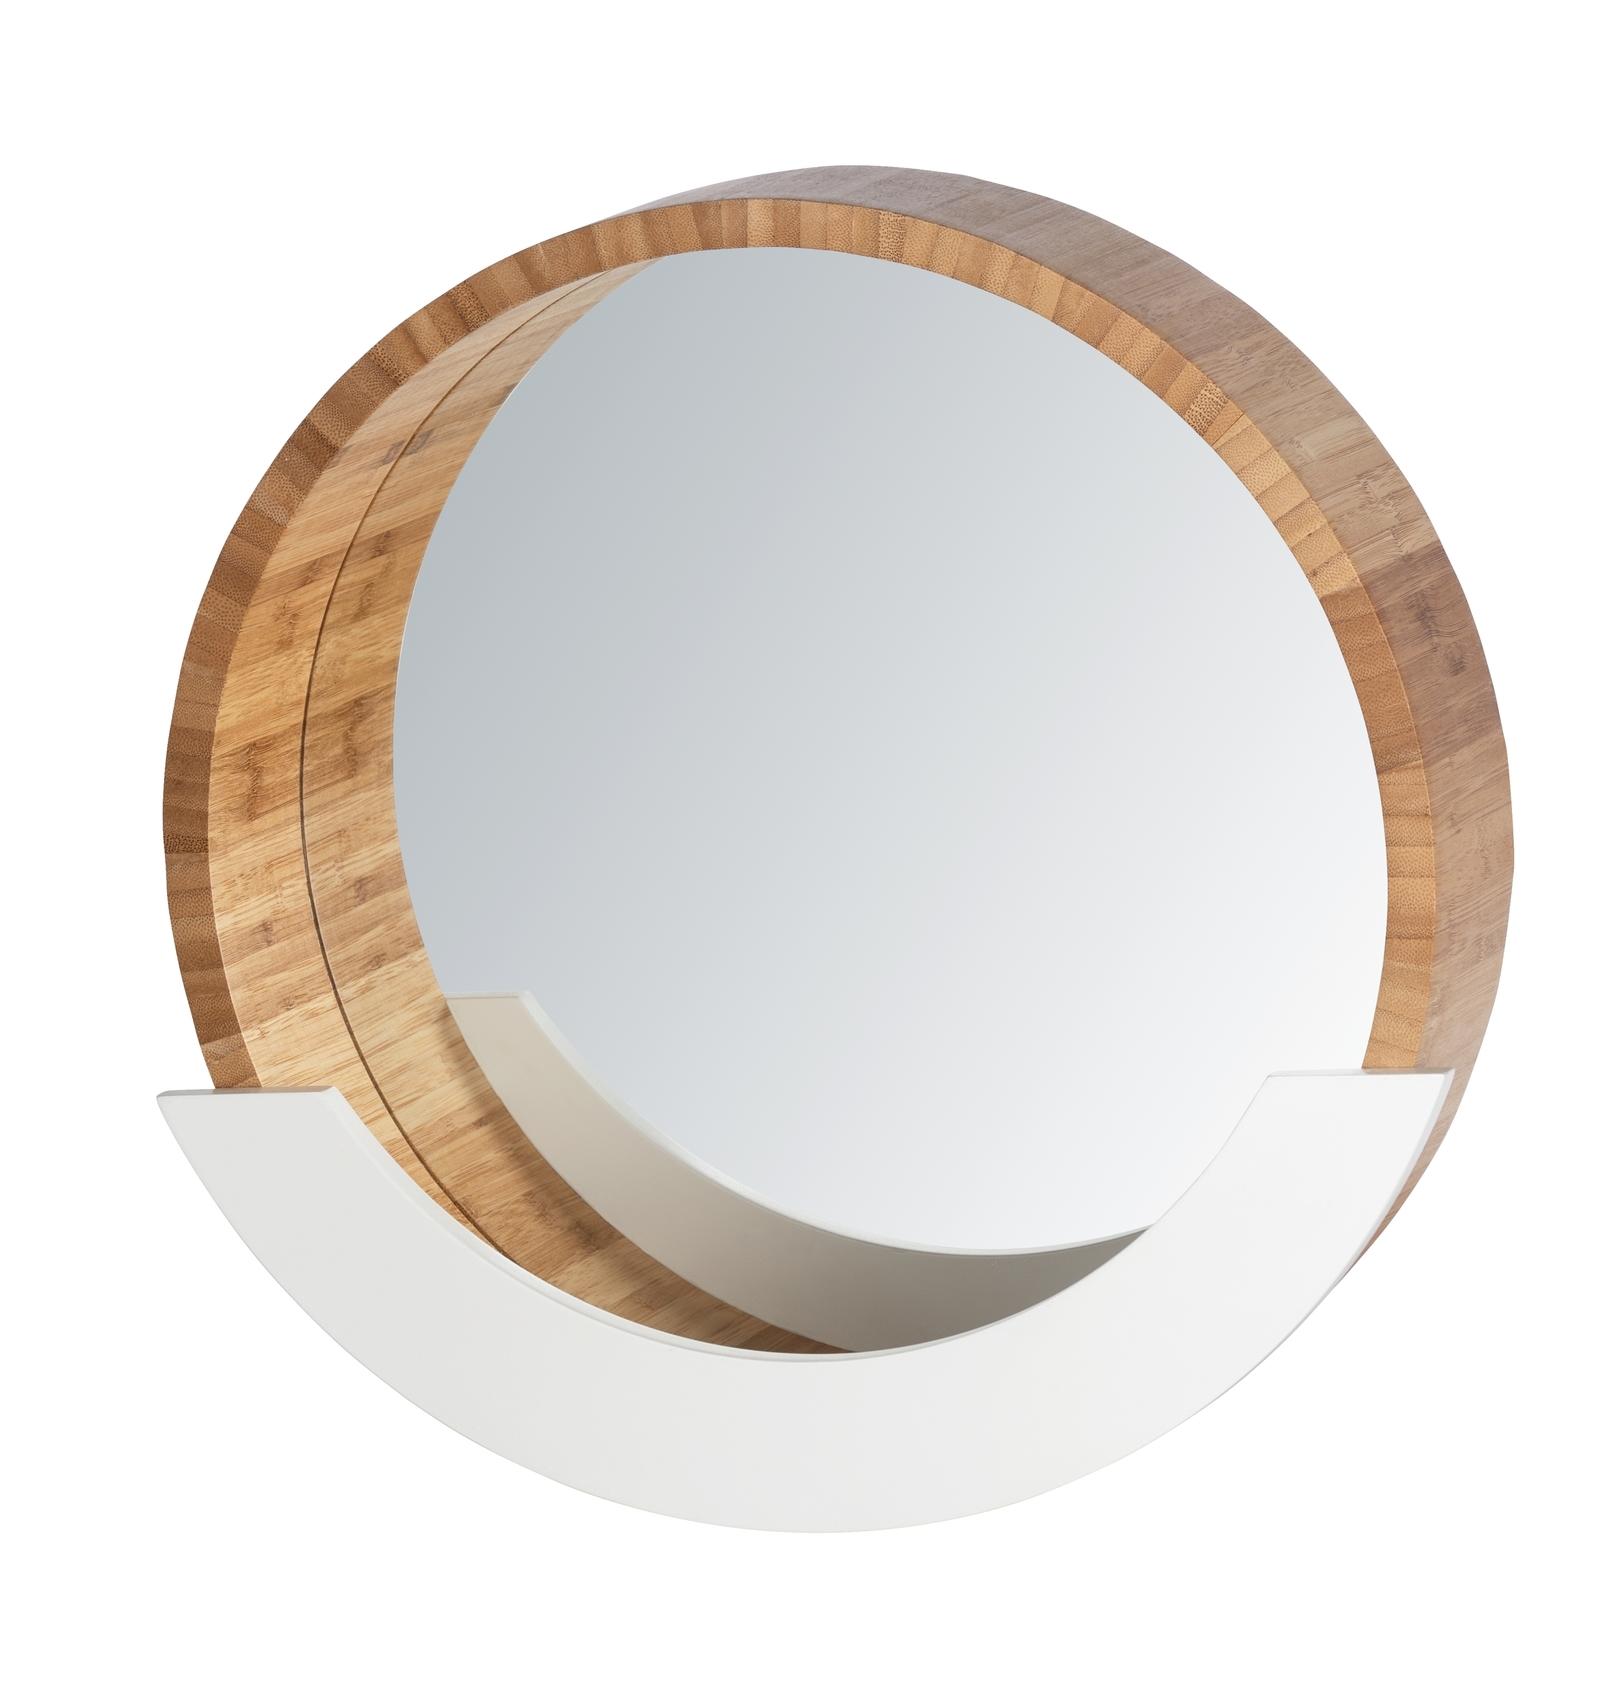 Oglinda pentru baie cu etajera, cu rama din bambus si MDF, Finja Natural / Alb, Ø39xA9,5xH38 cm poza